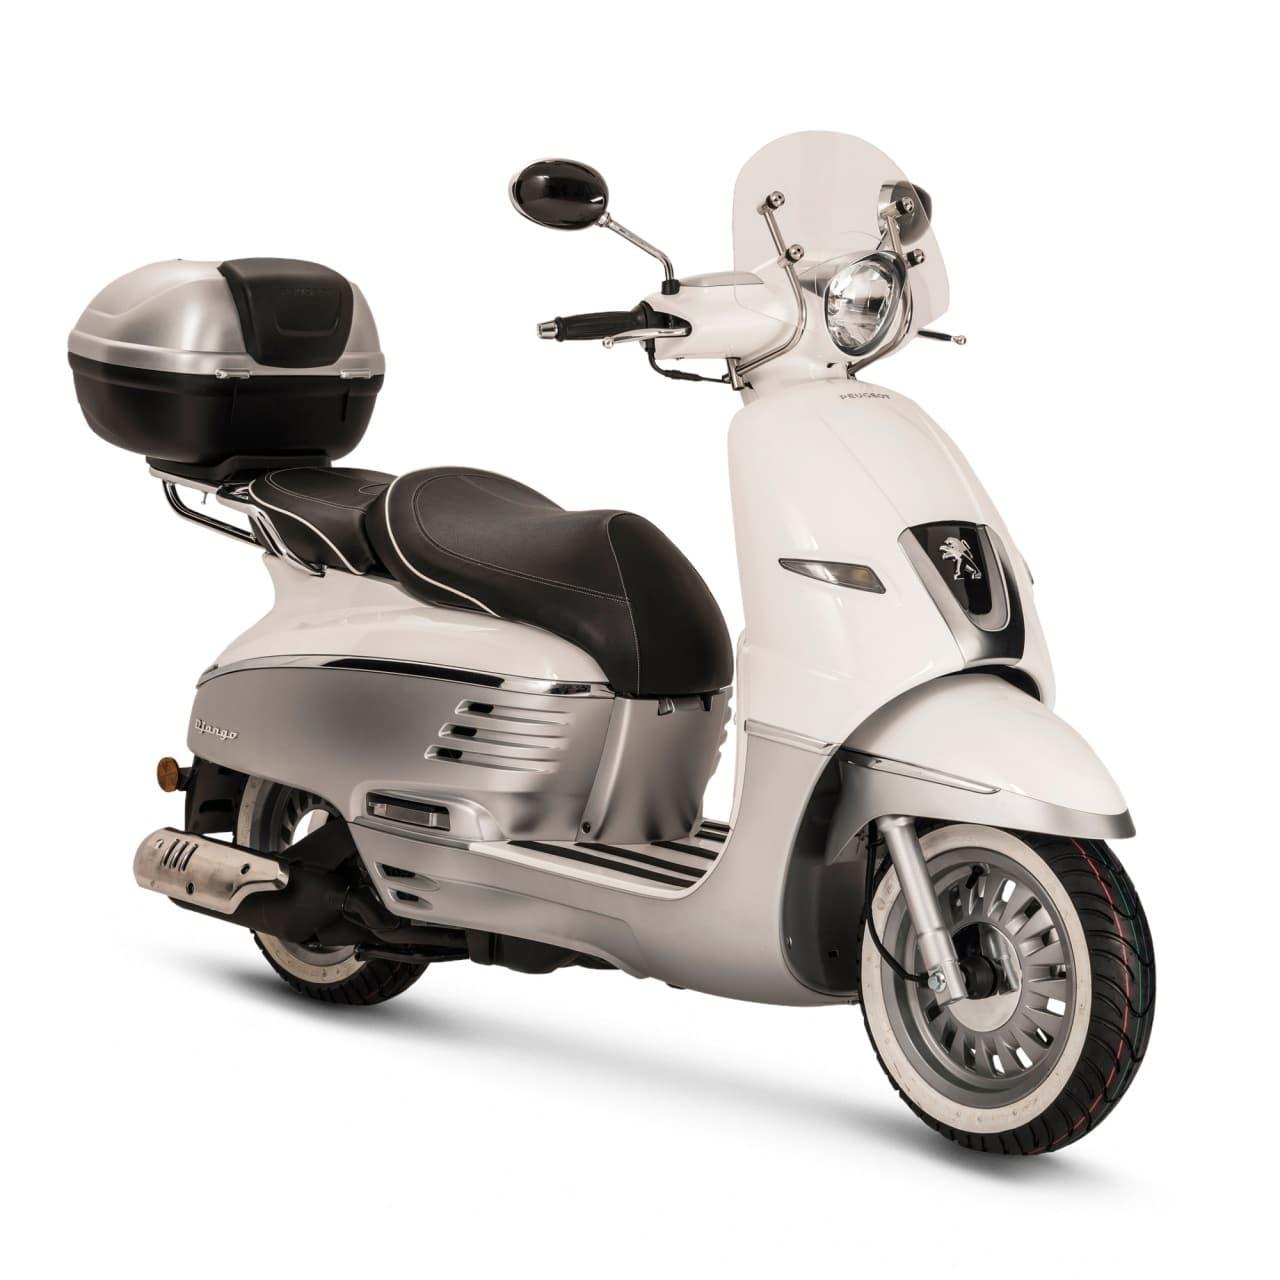 le mod le peugeot 2014 django 125 shopping scooter. Black Bedroom Furniture Sets. Home Design Ideas